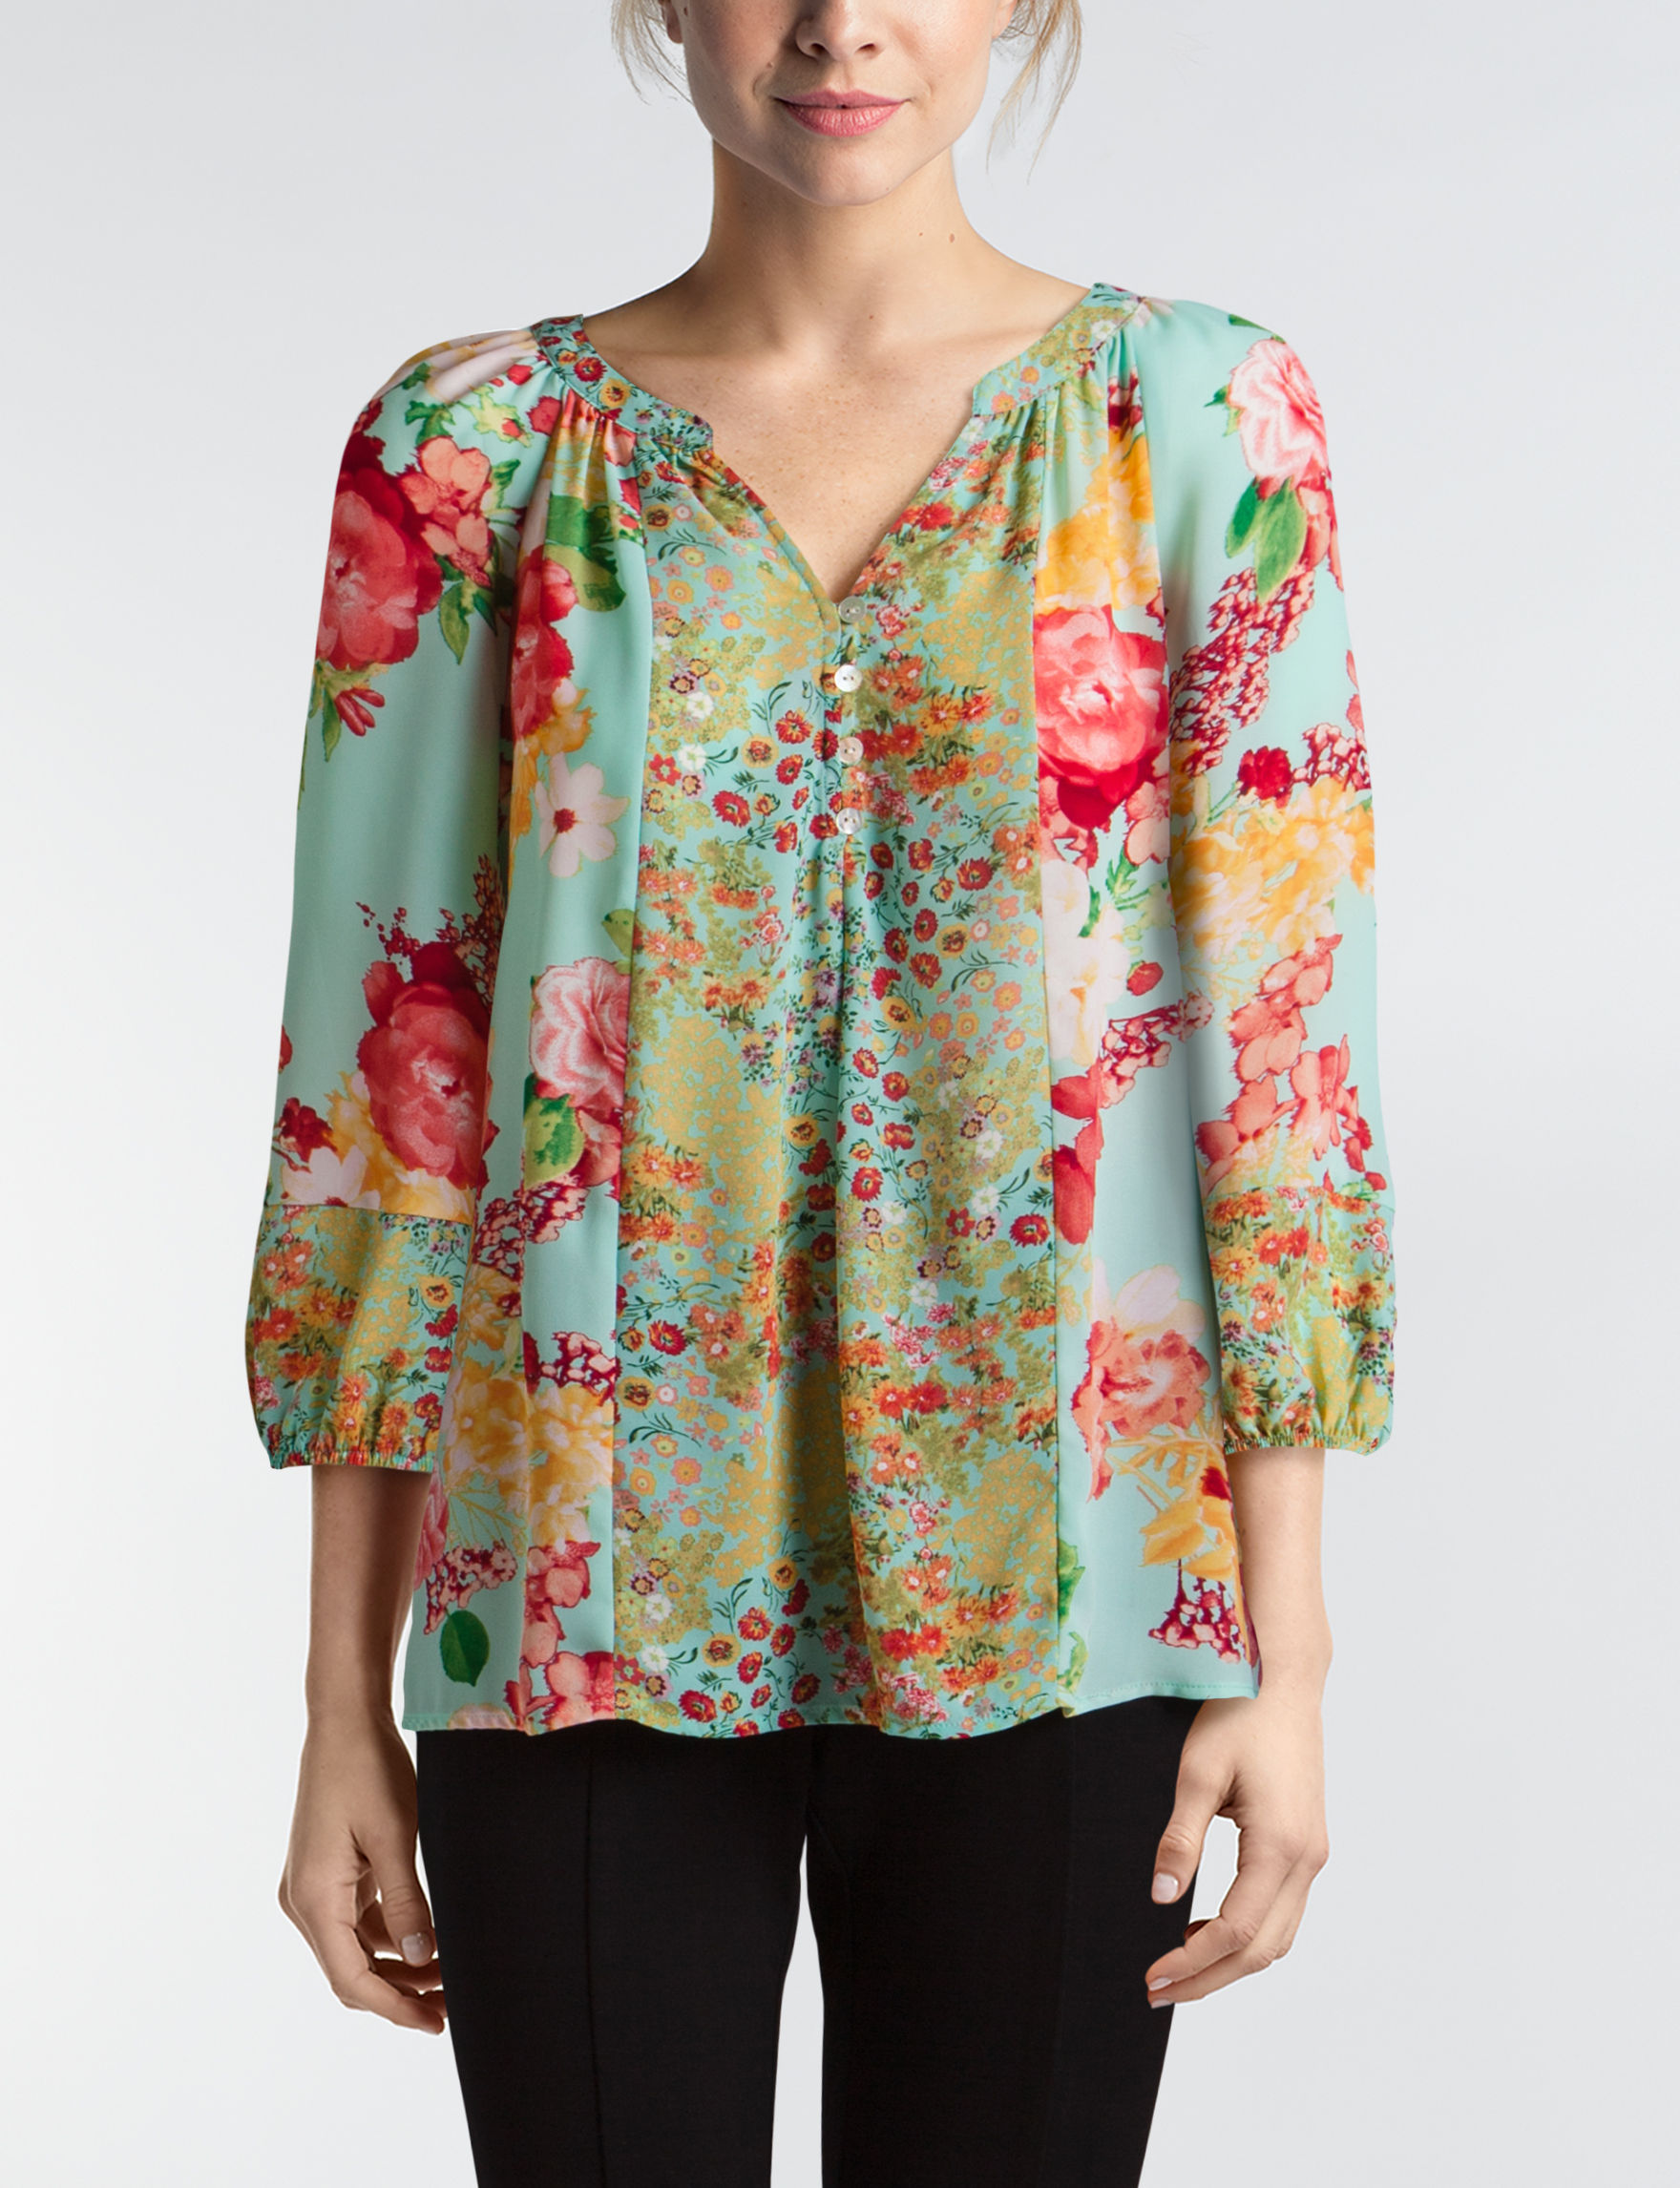 Valerie Stevens Seafoam Pull-overs Shirts & Blouses